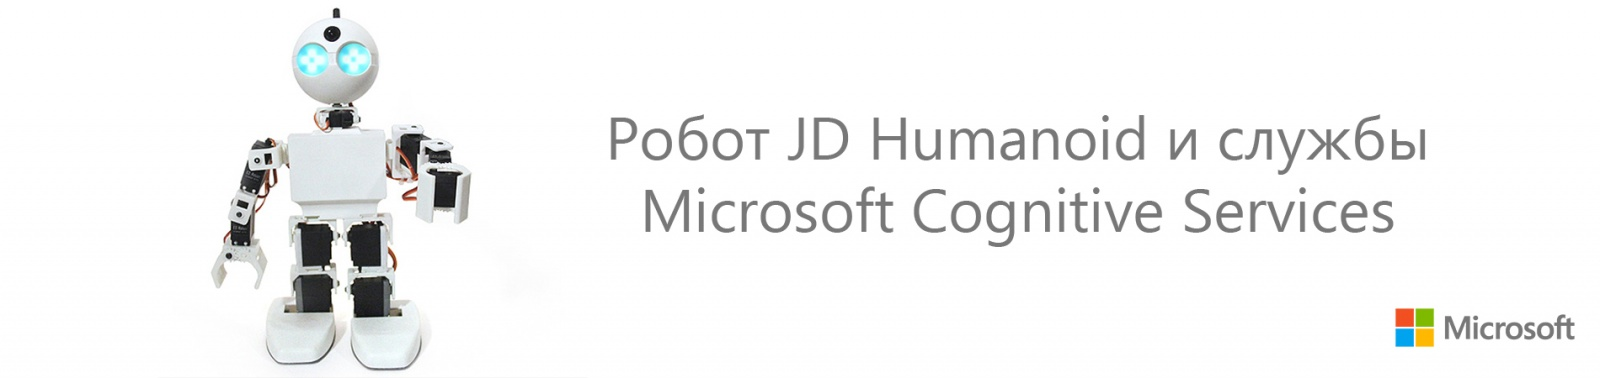 Робот JD Humanoid и службы Microsoft Cognitive Services - 1